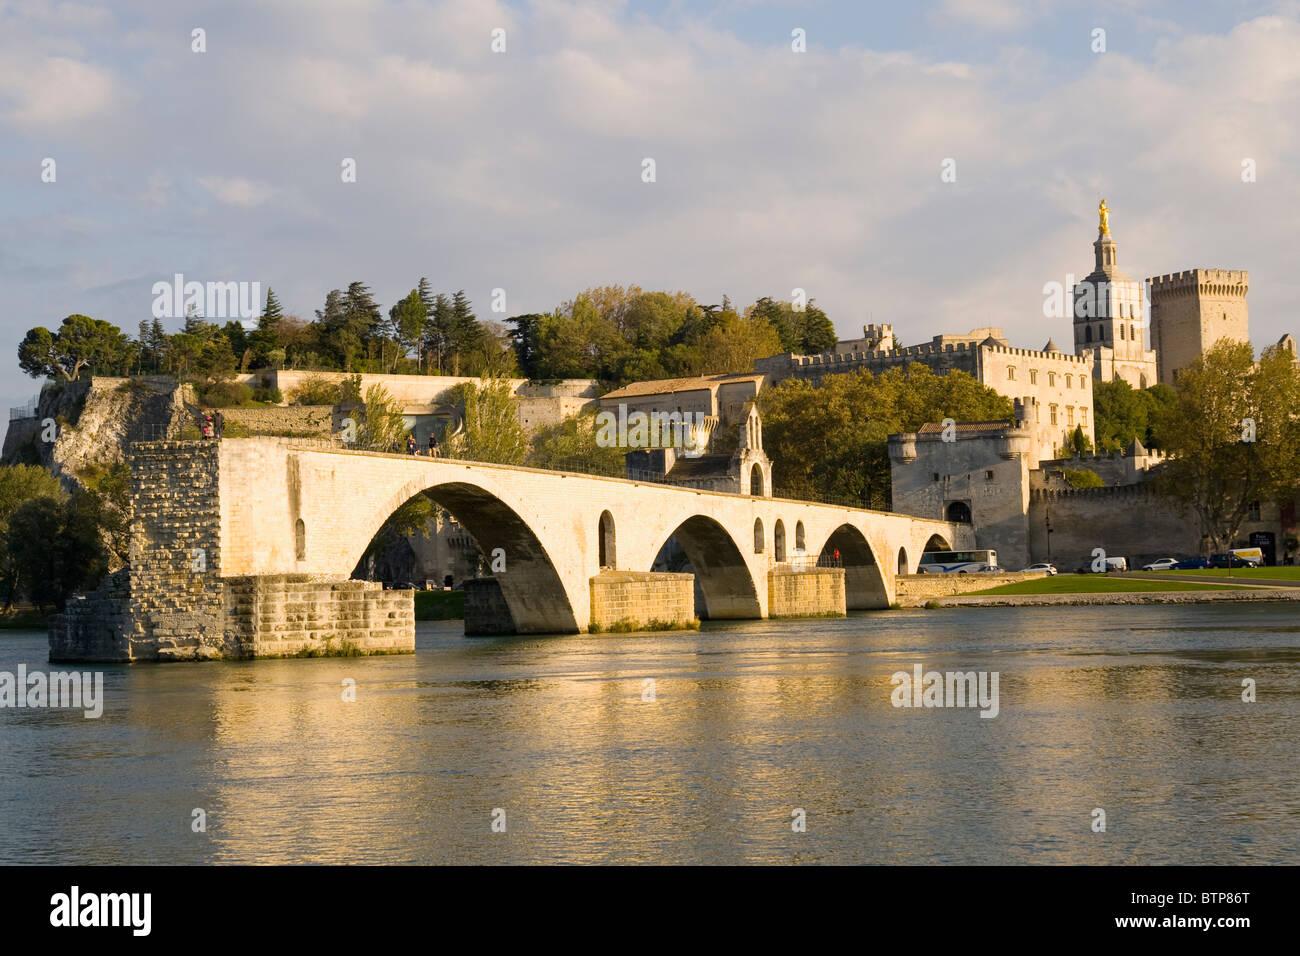 Pont St Benezet over River Rhone, Avignon, Provence, France - Stock Image